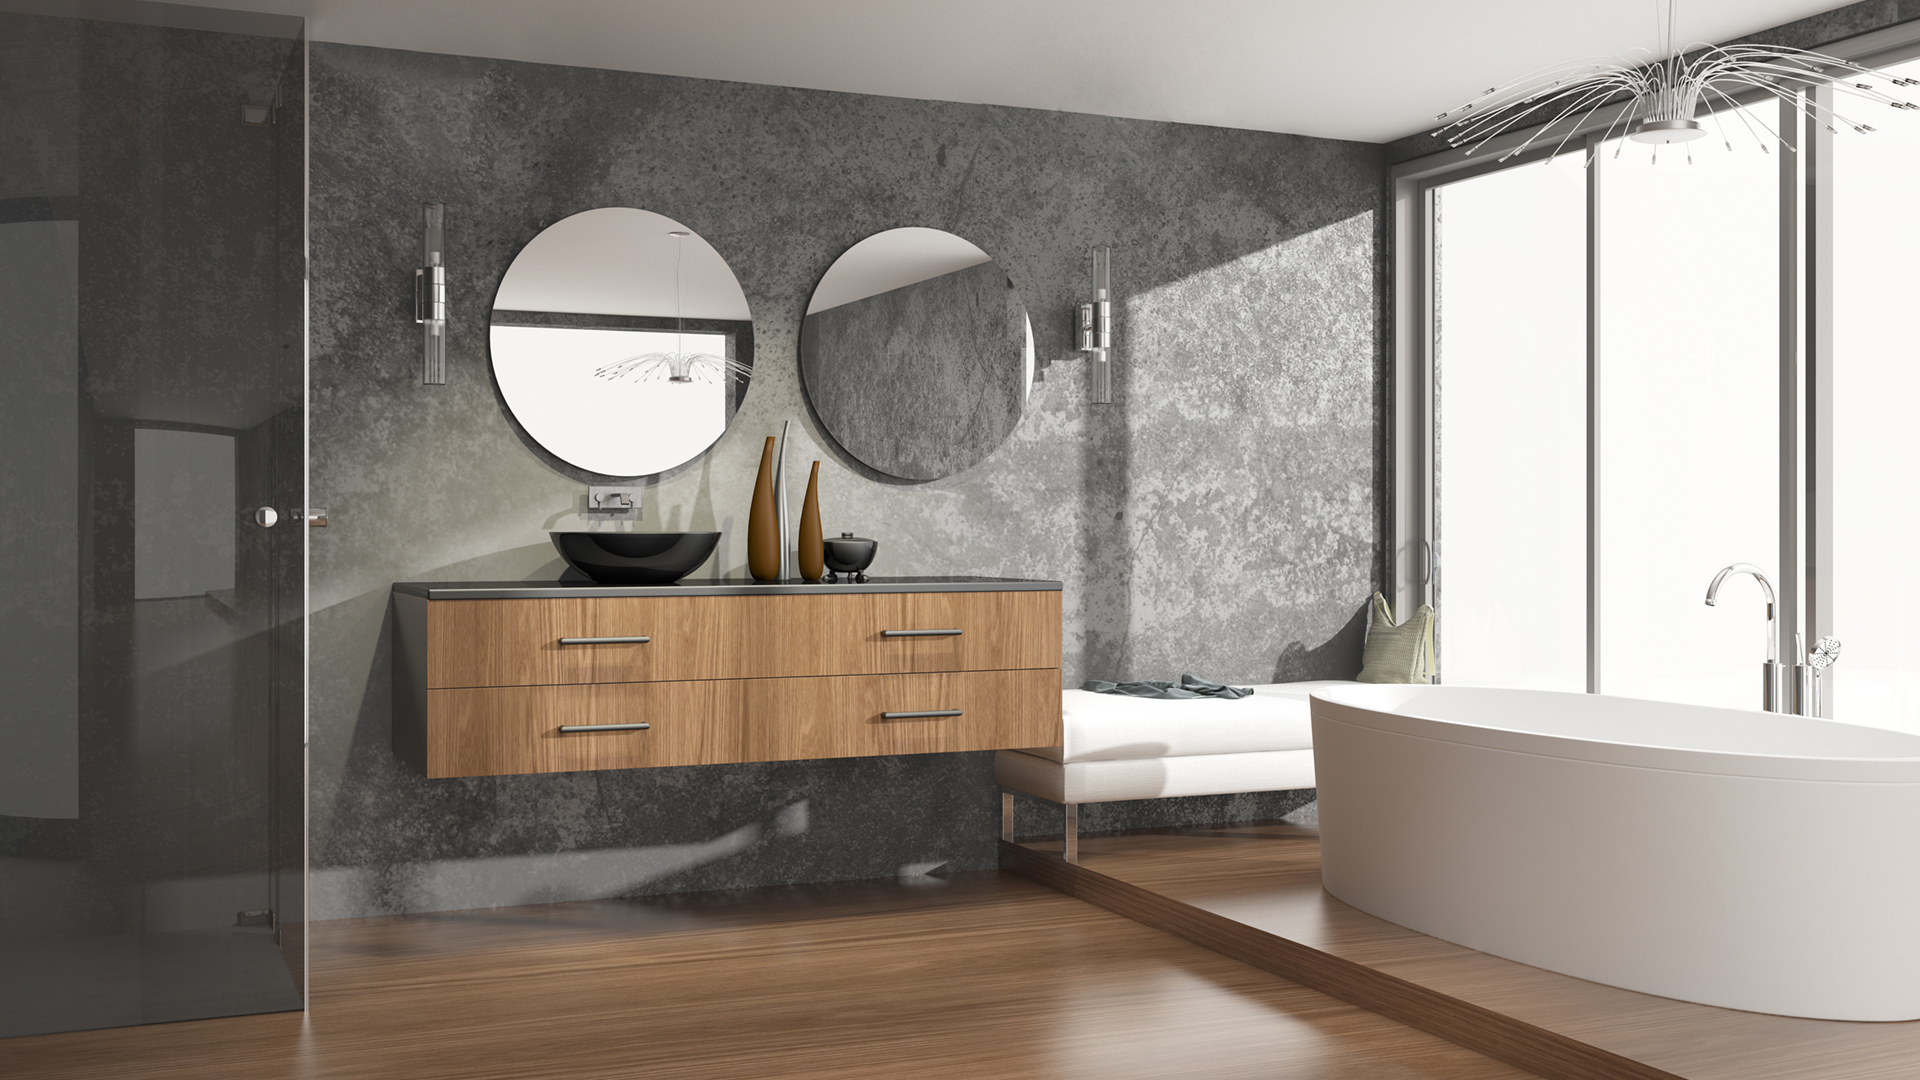 parkettboden im badezimmer. Black Bedroom Furniture Sets. Home Design Ideas